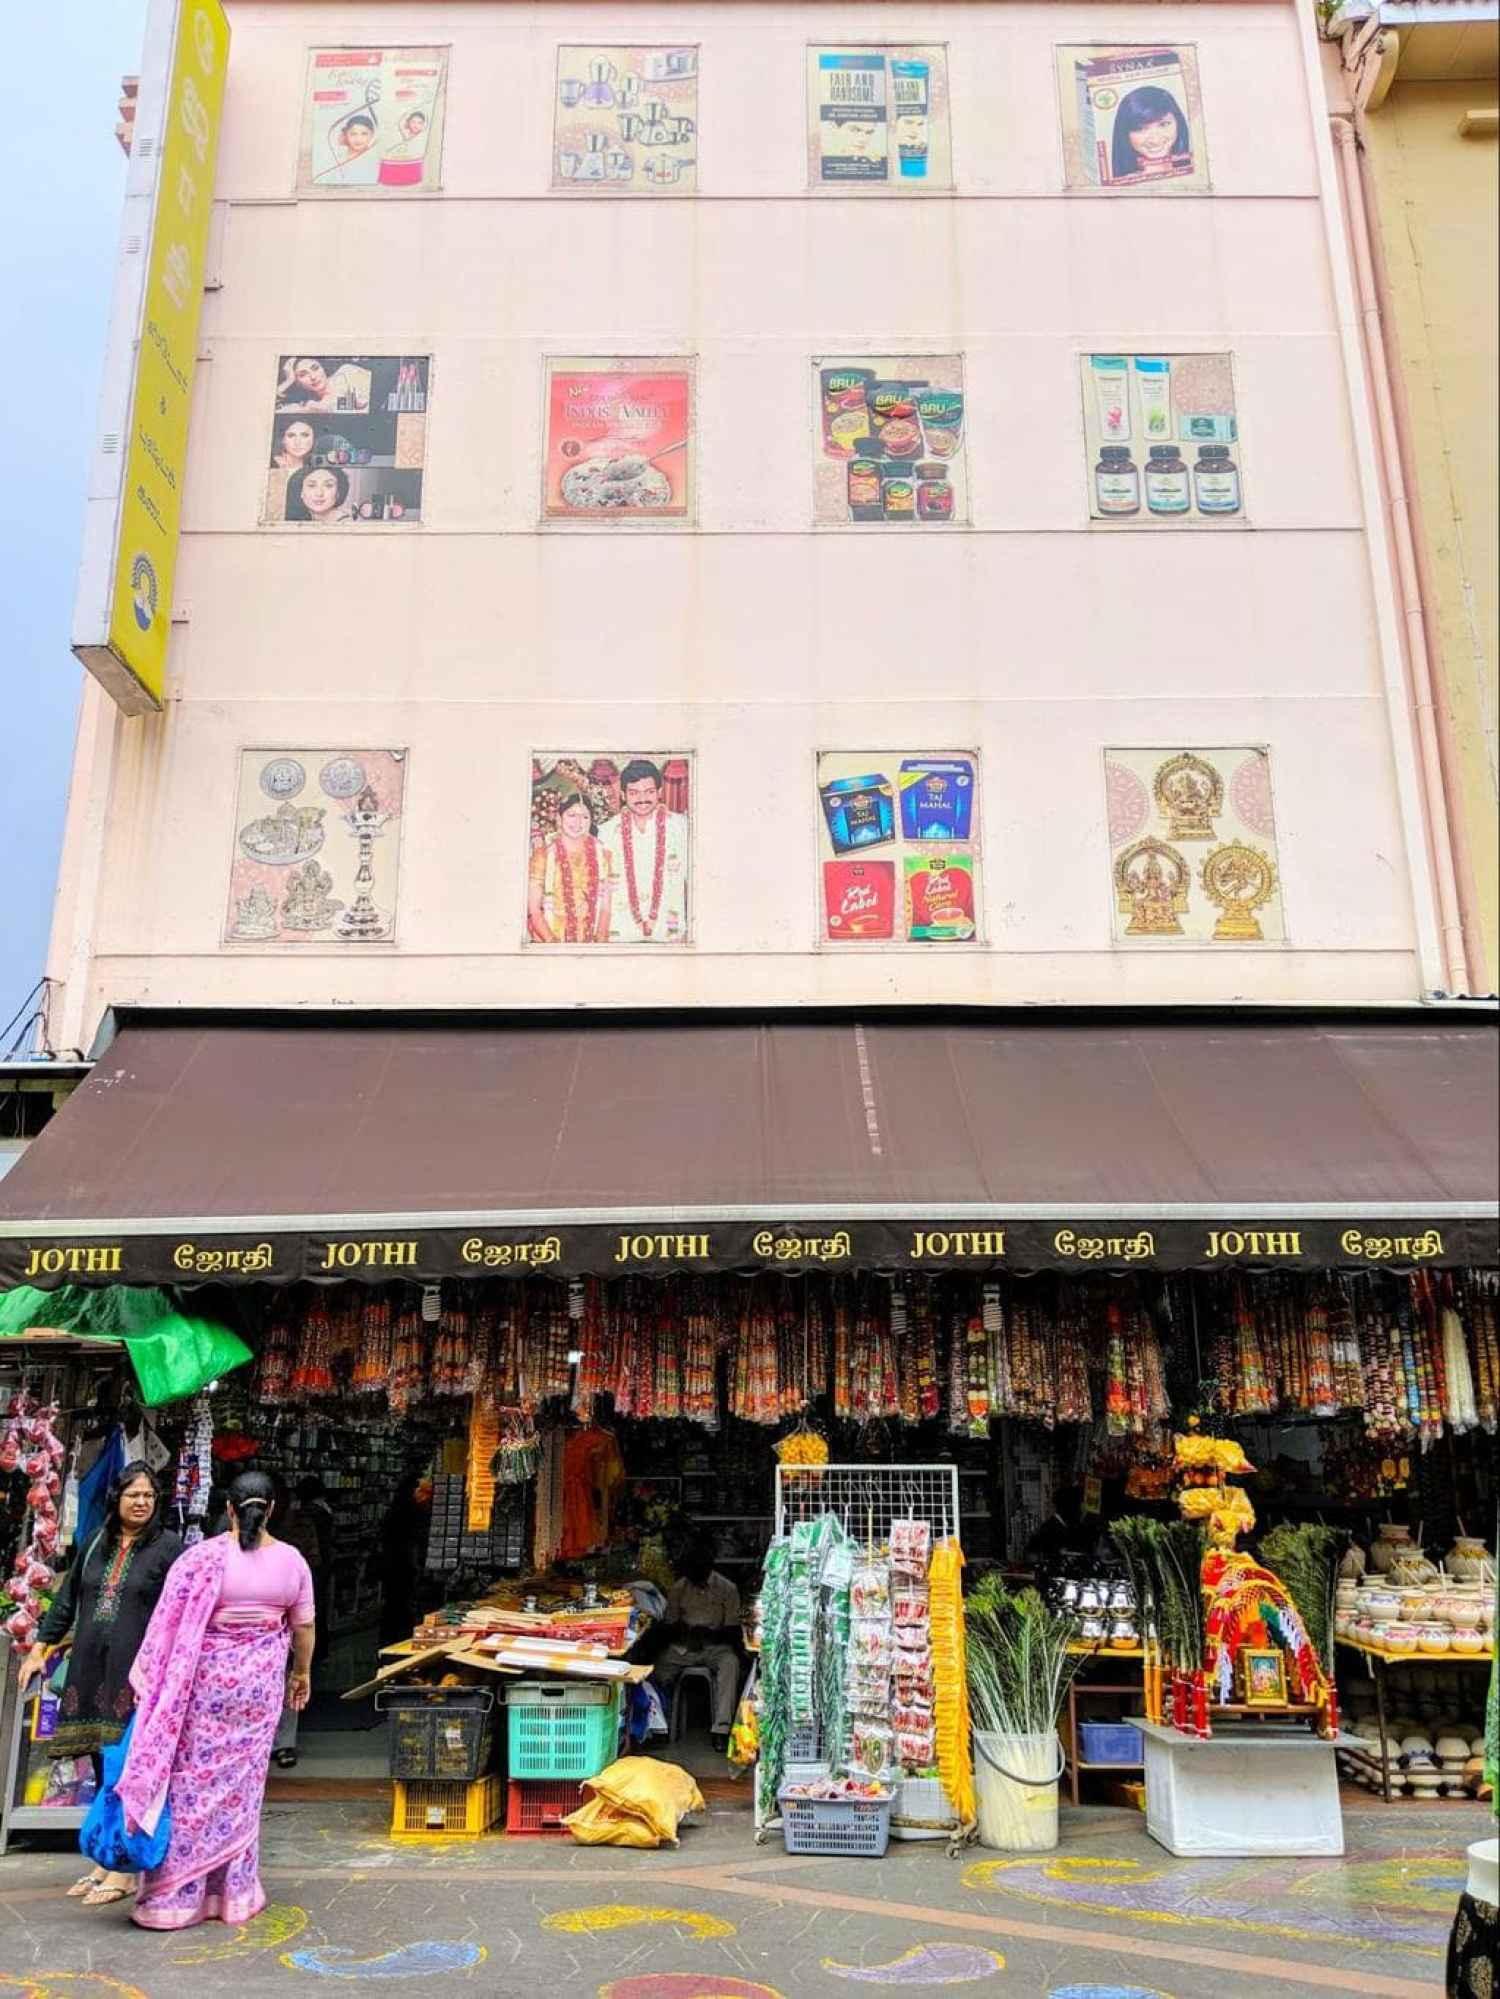 Little India Arcade mural